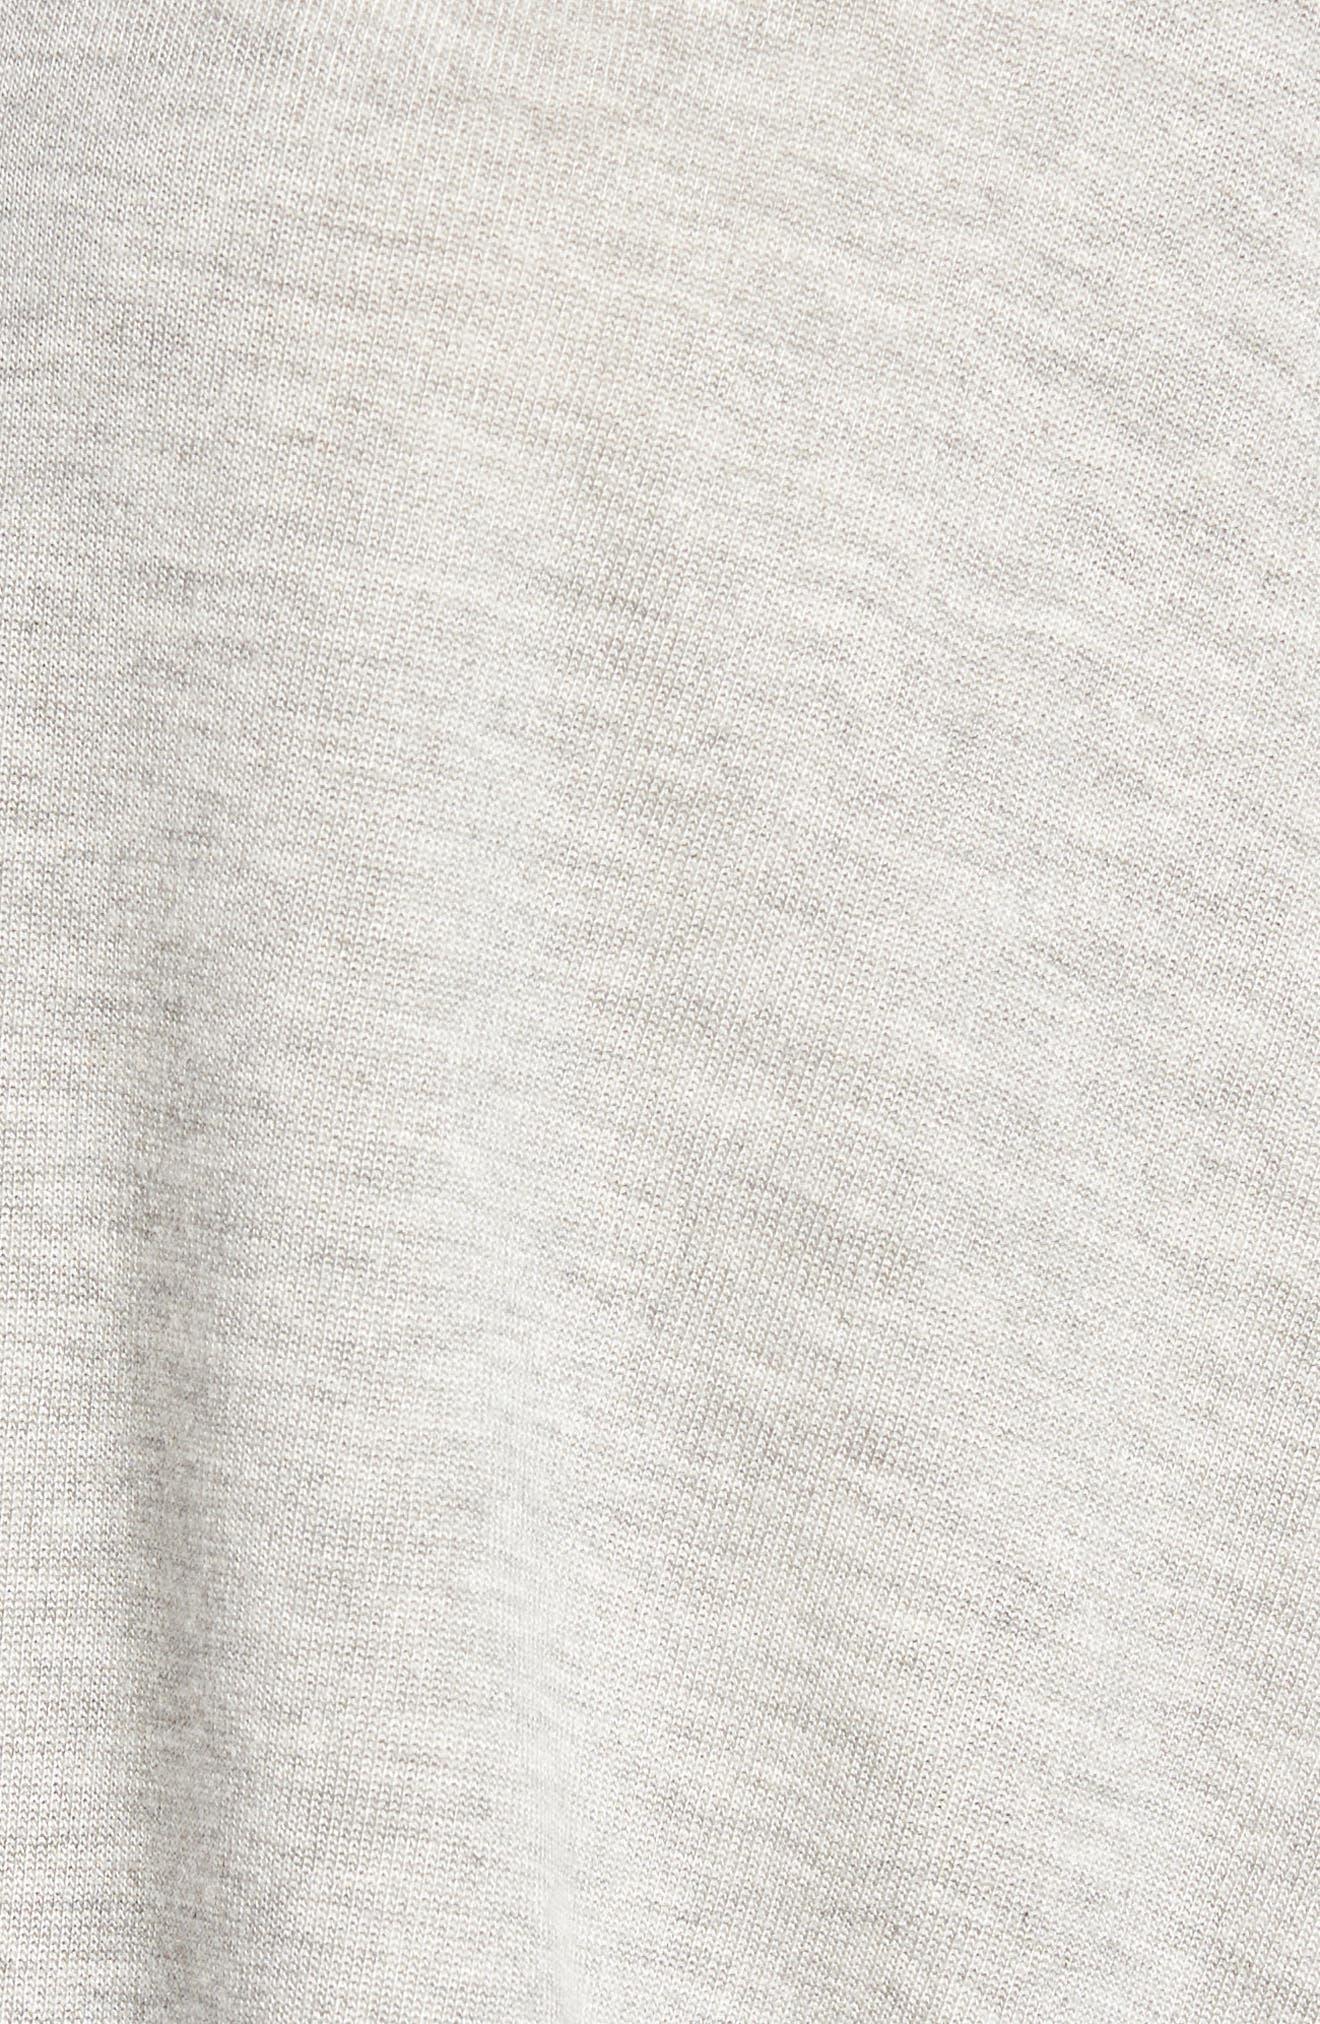 All Star Nella Pullover Sweatshirt,                             Alternate thumbnail 6, color,                             020